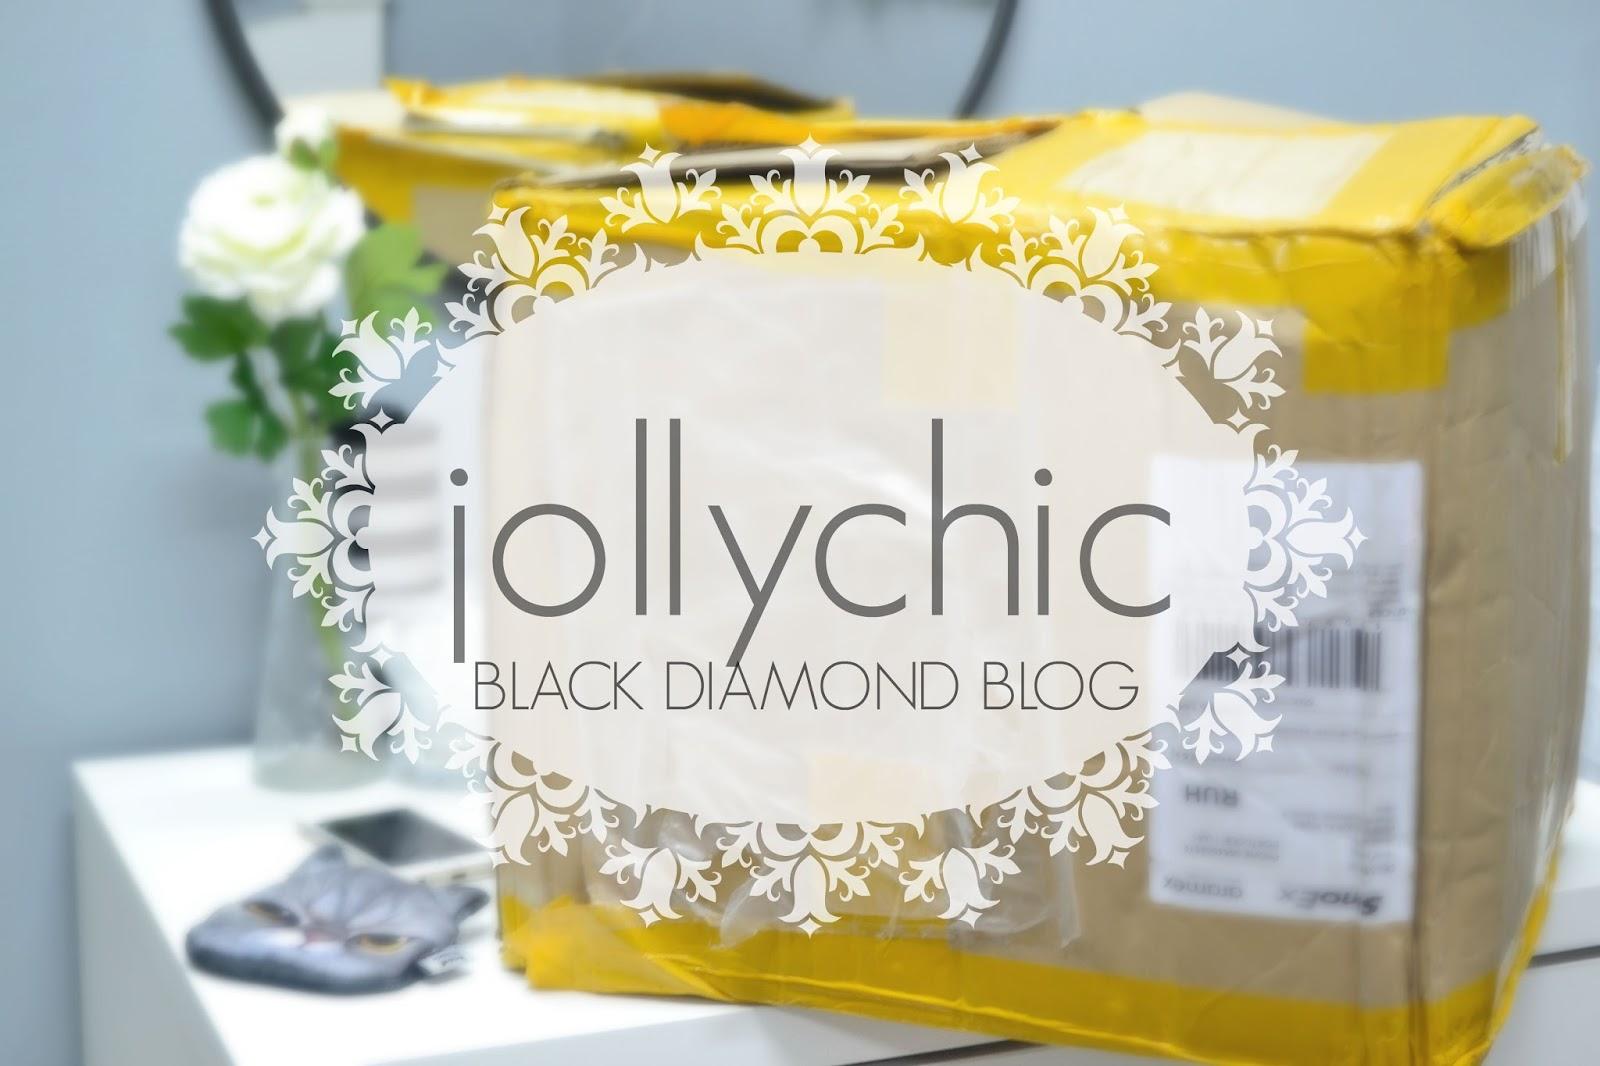 465adfd04 Black Diamond : تجربتي من موقع جولي شيك jollychic ! محدث